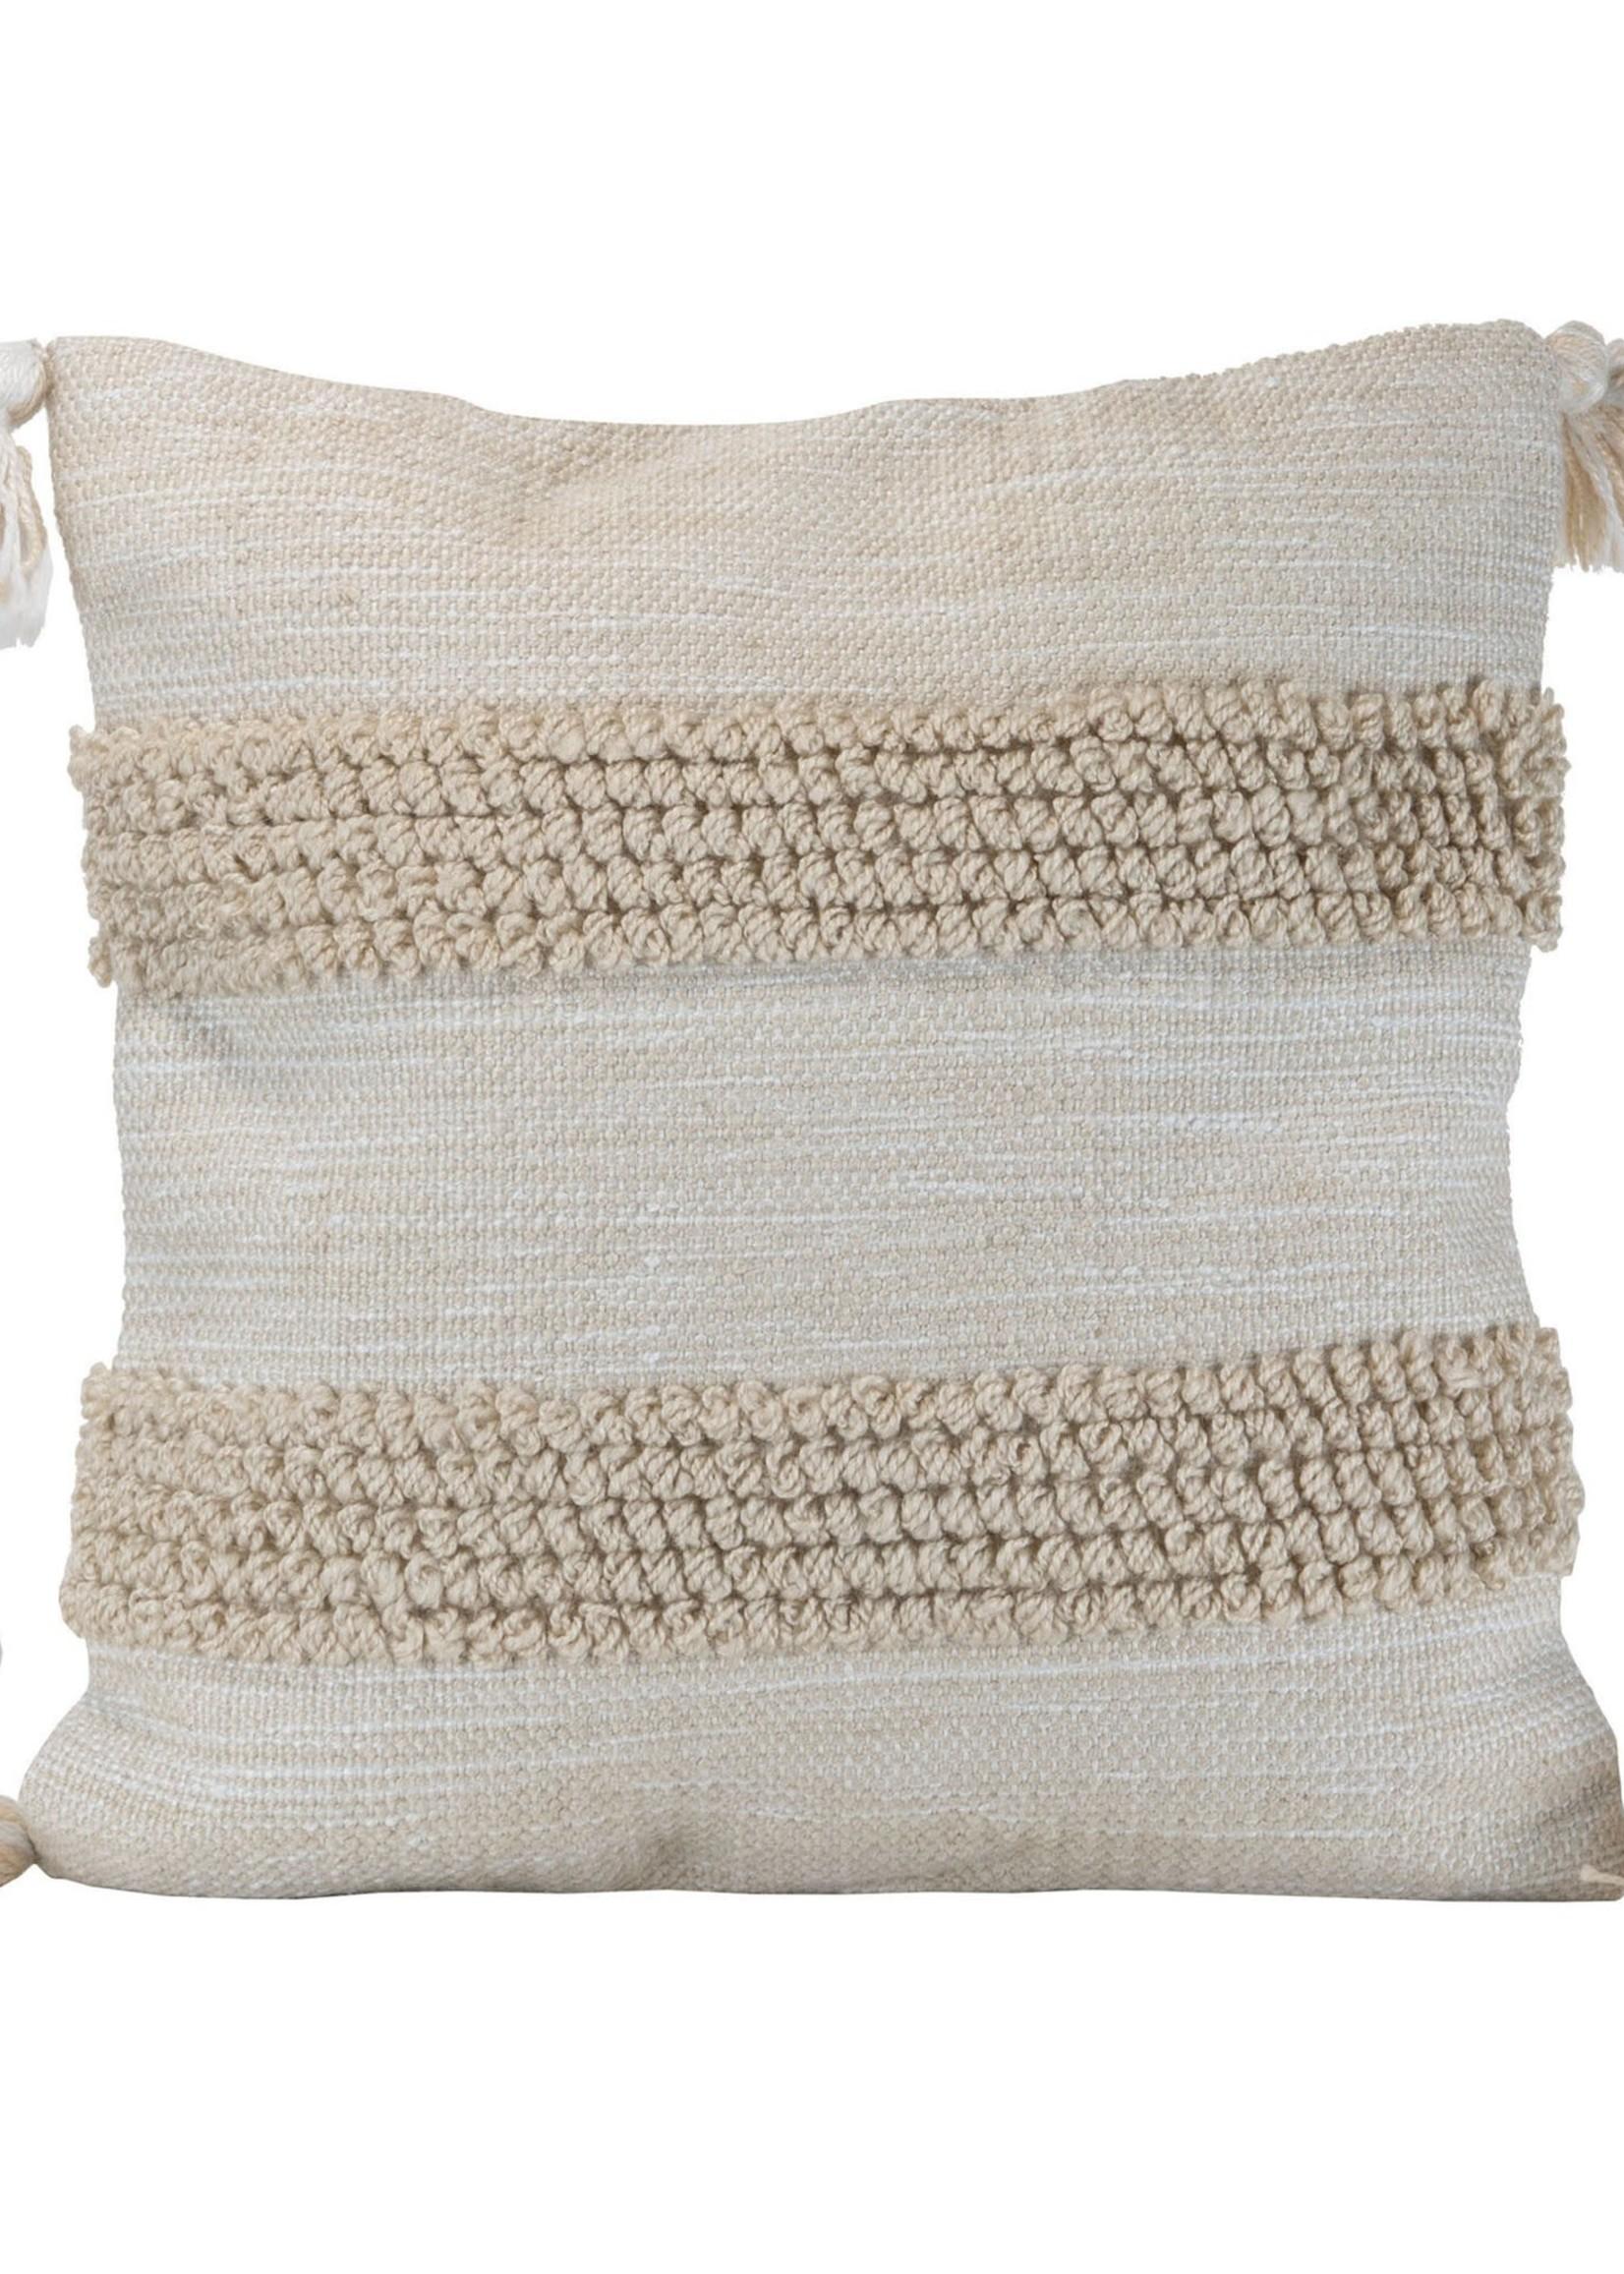 Hand Woven Kaila Pillow